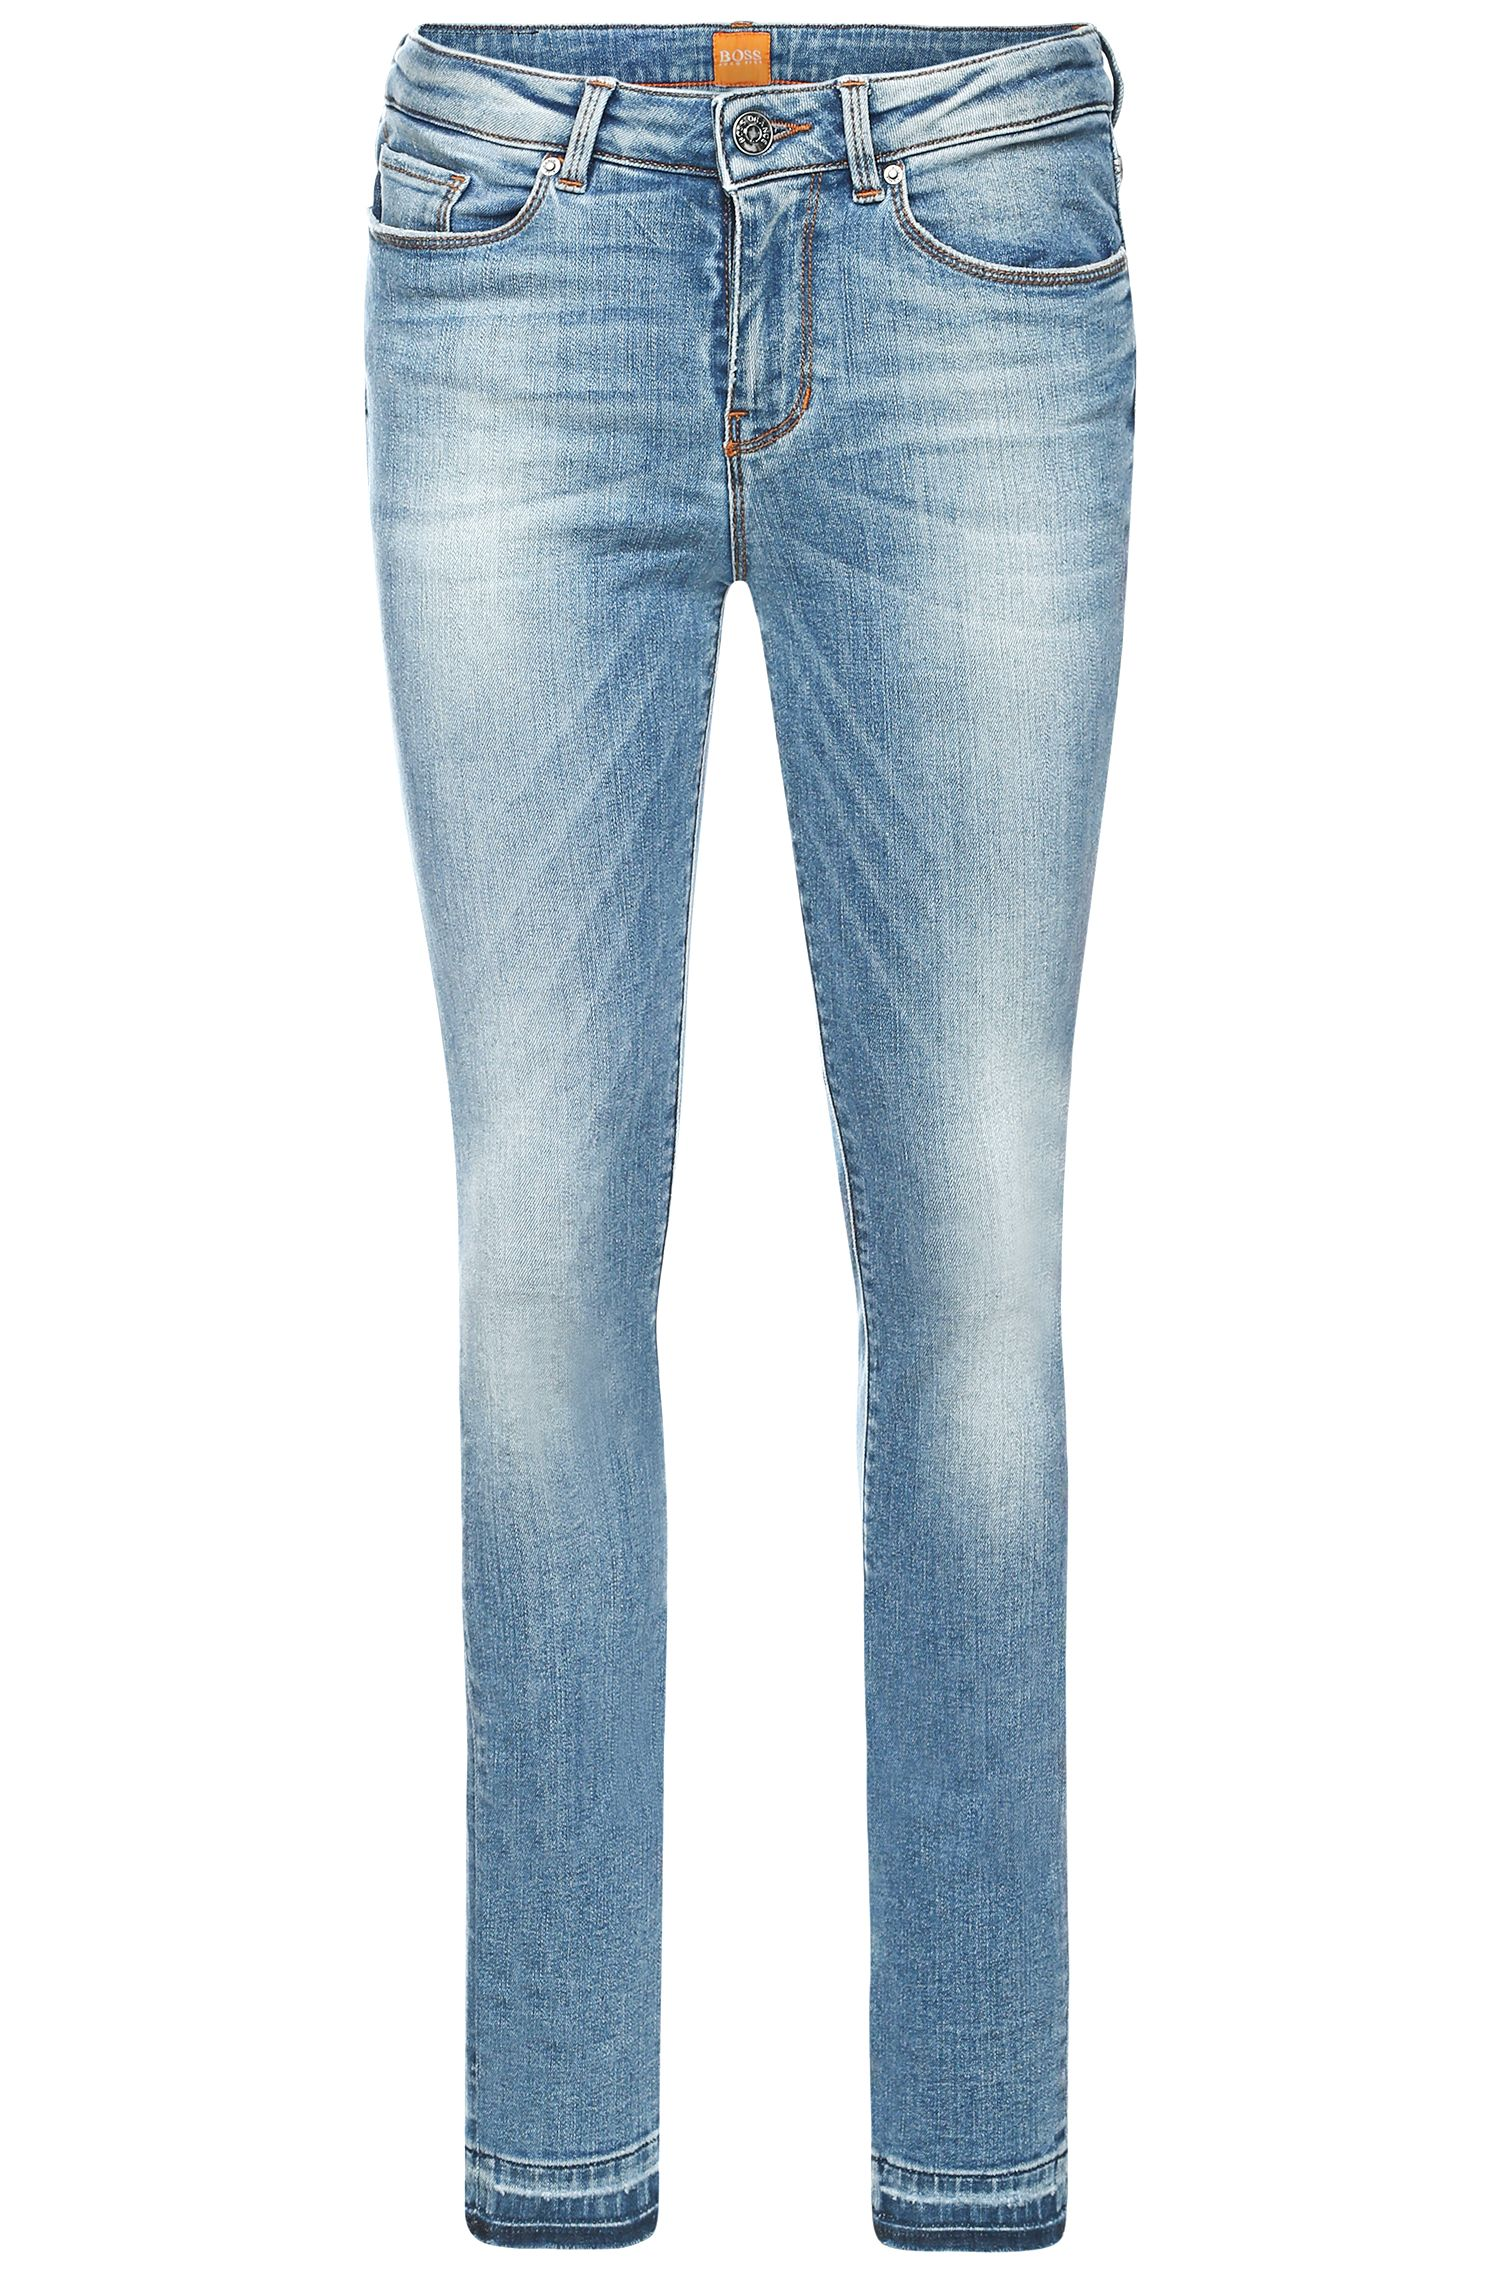 'Orange J' | Stretch Cotton Blend Skinny Jeans